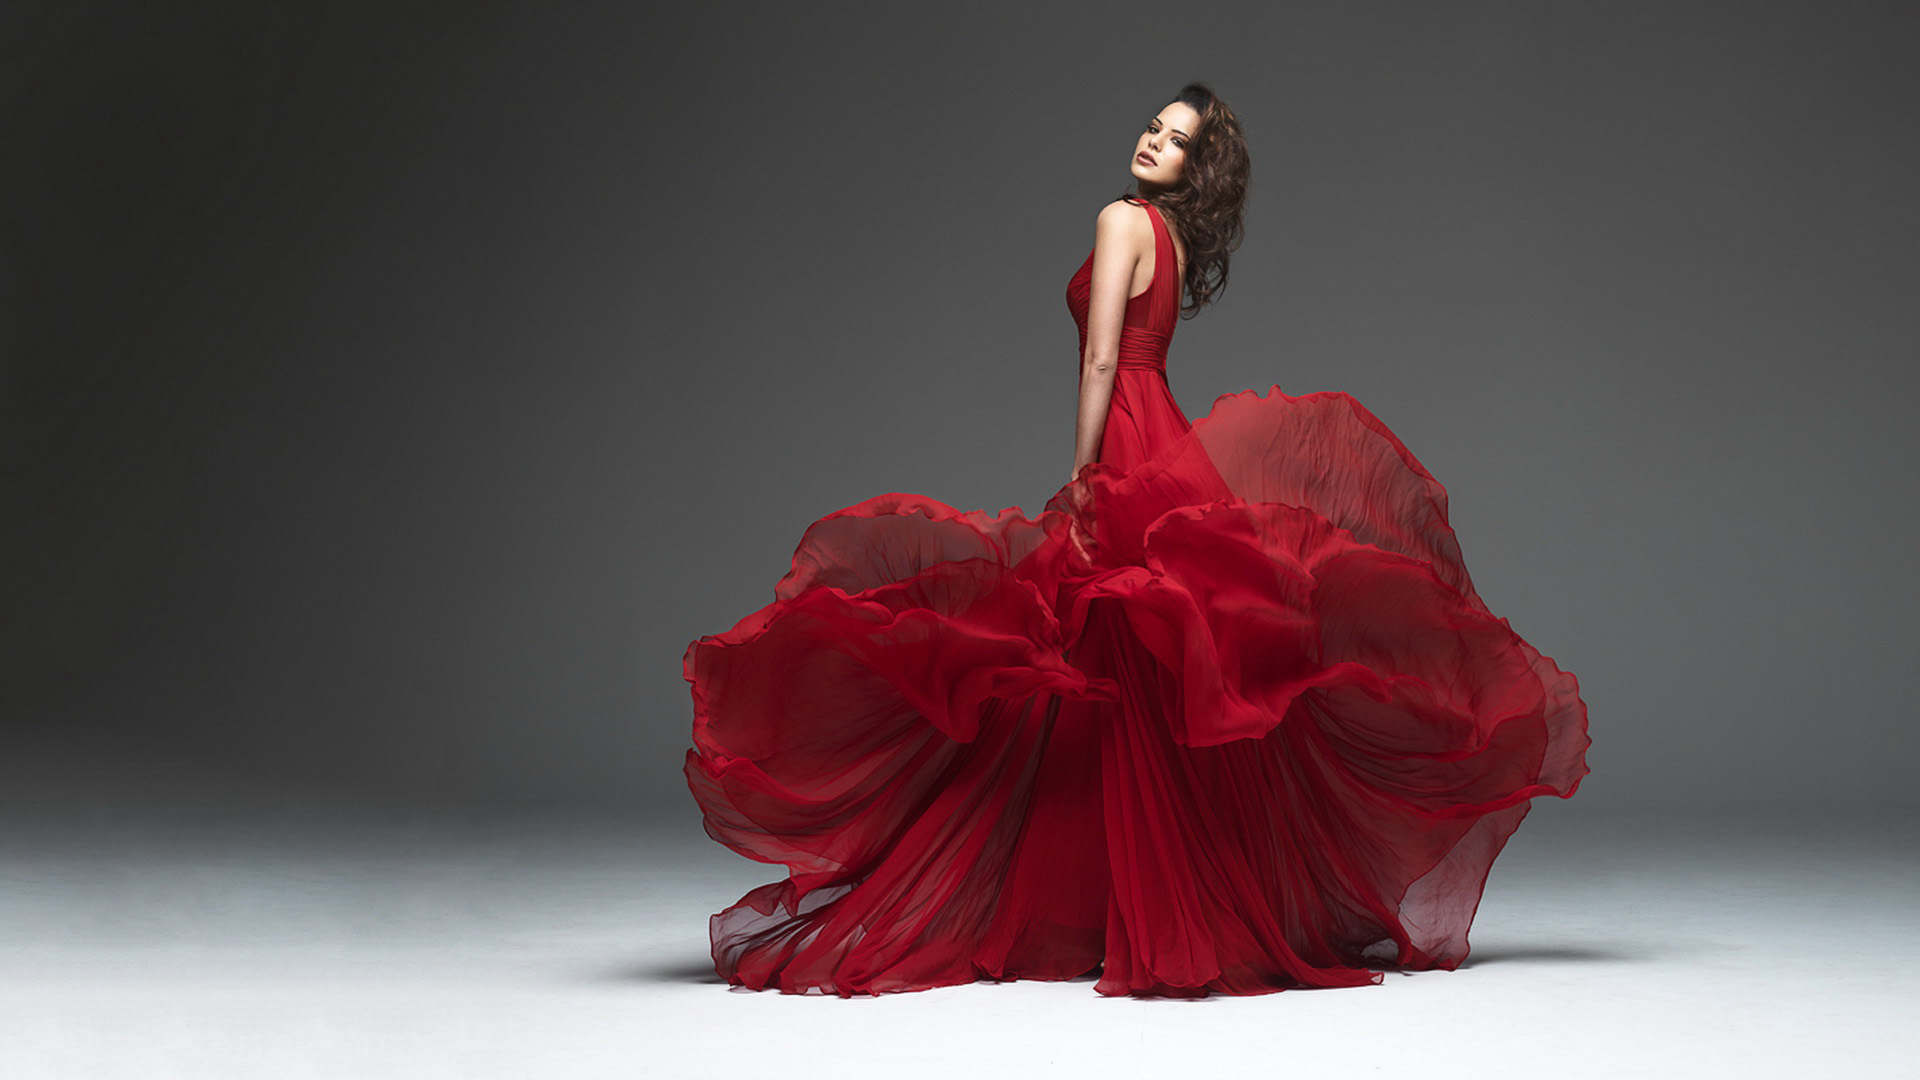 733ebd6f_Girl-Fashion-Dress-Red-Desktop-Wallpaper